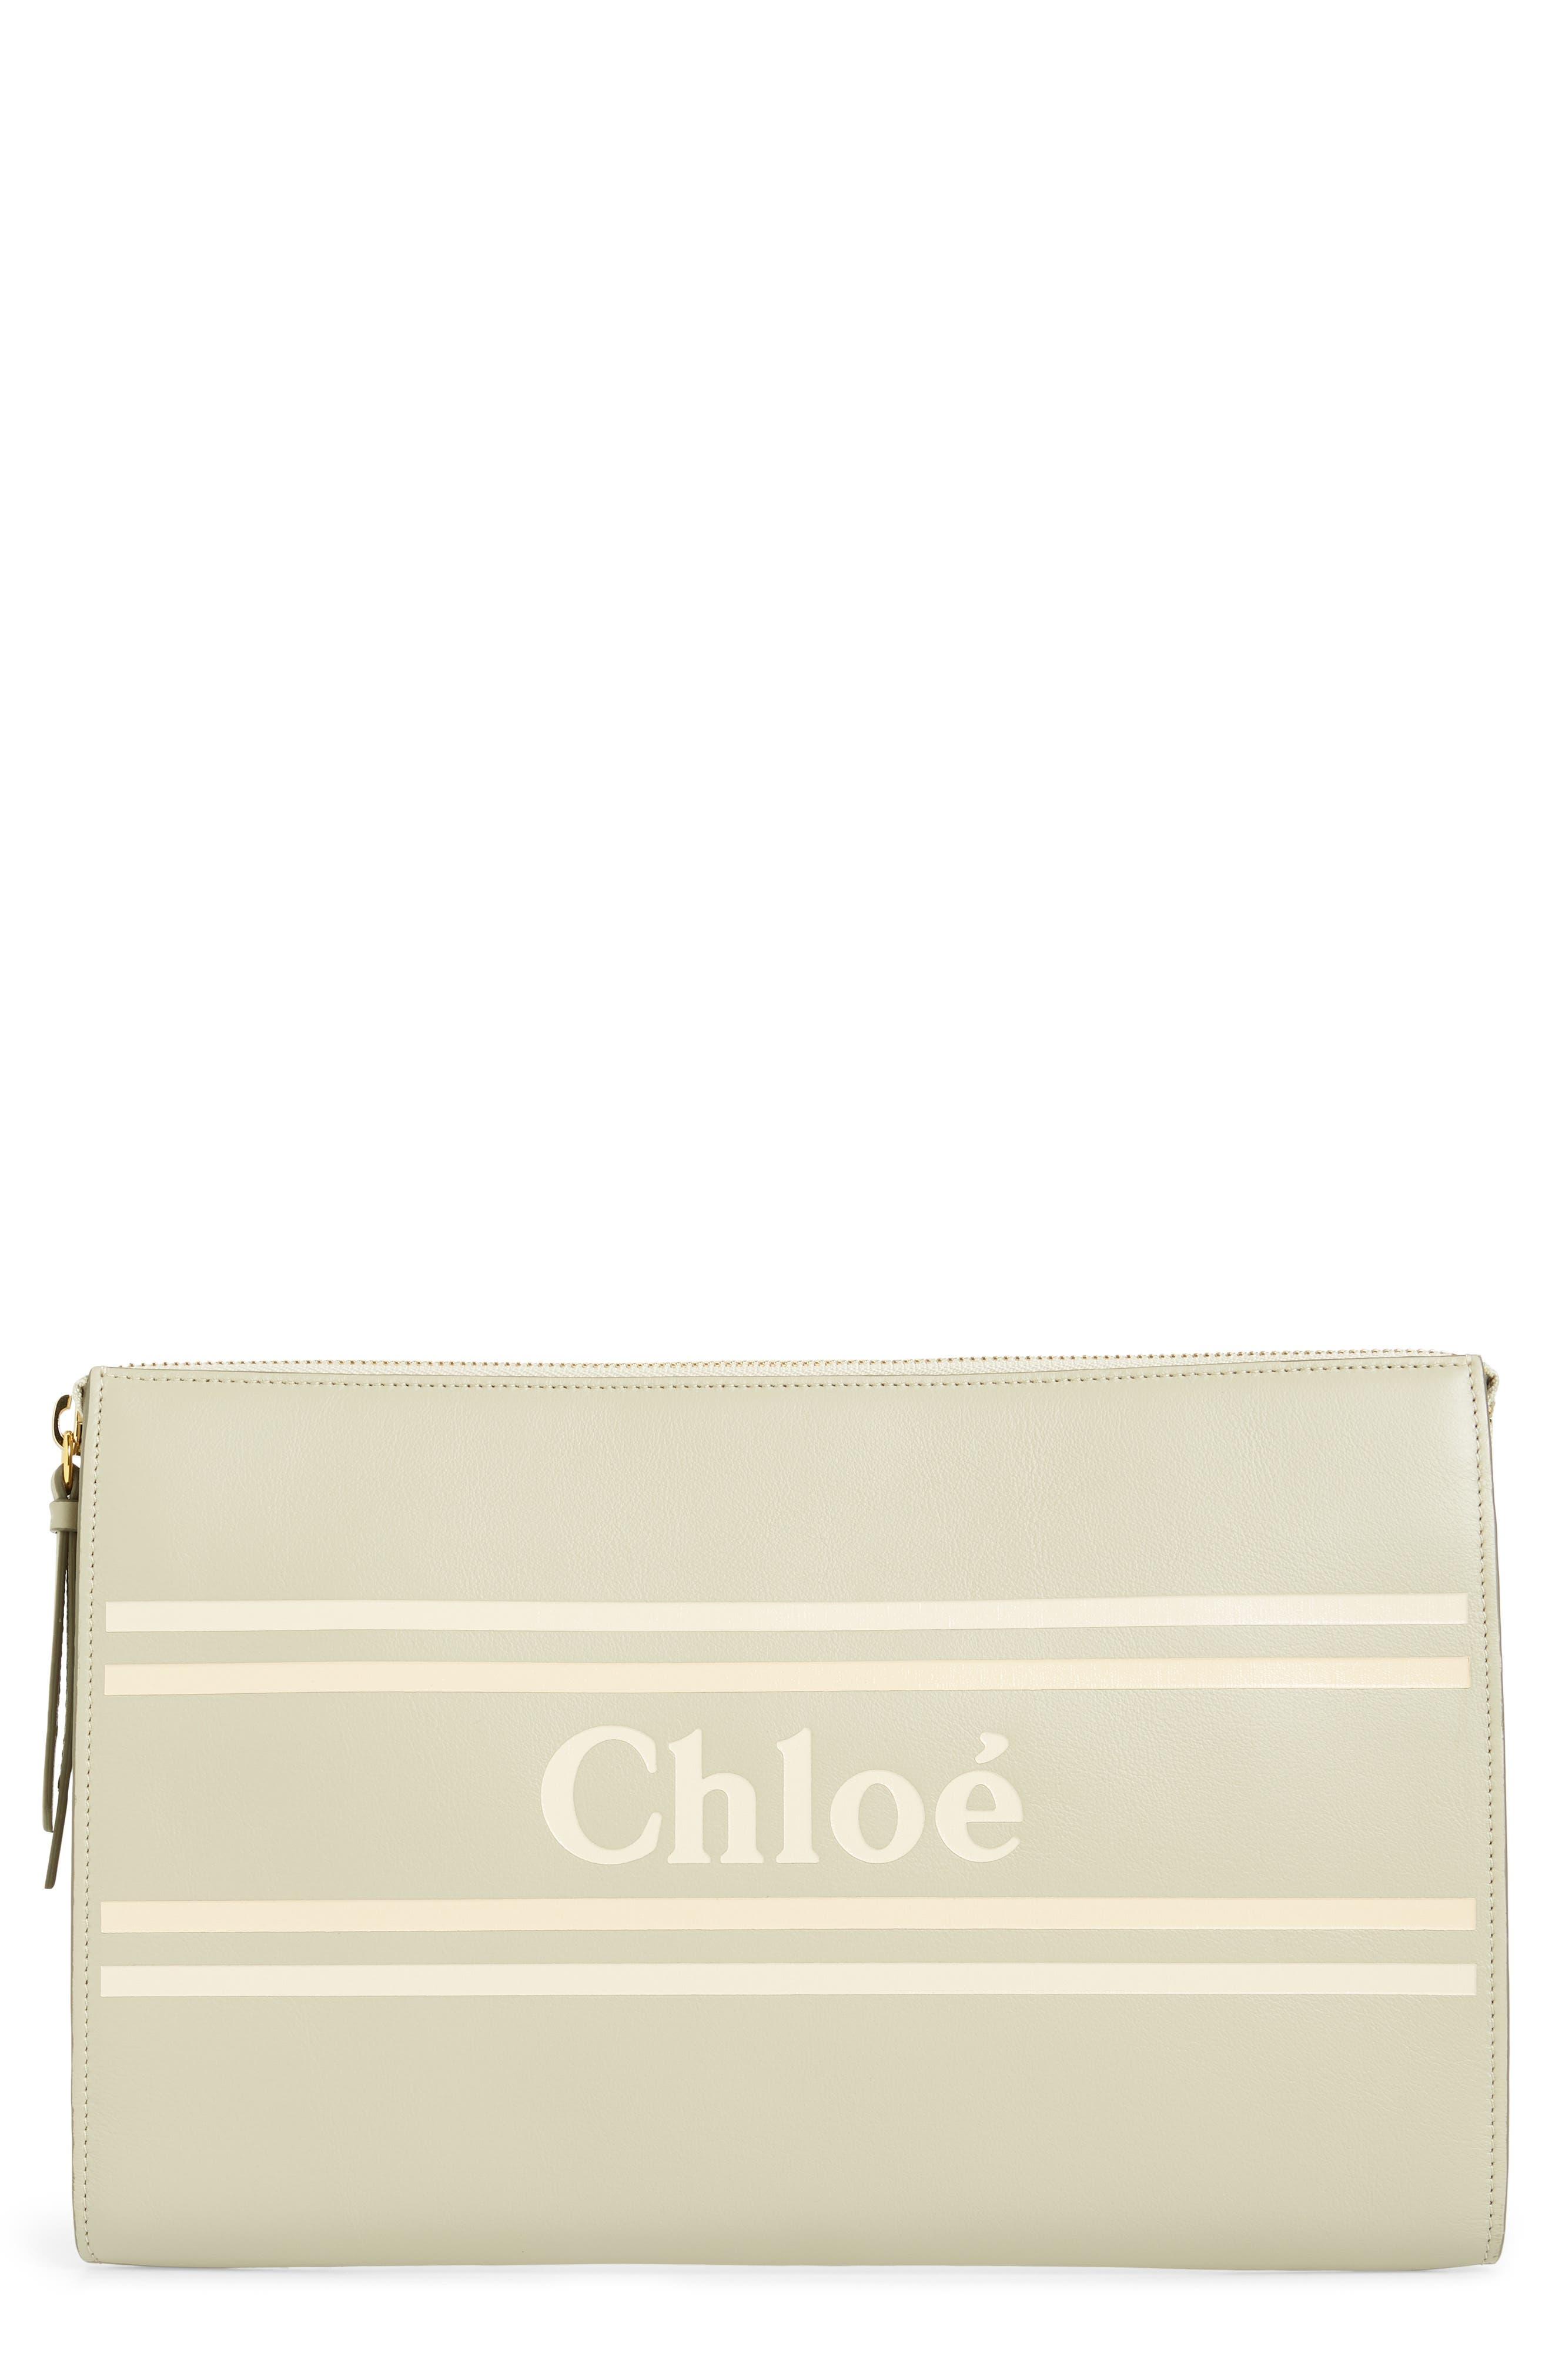 Chloé Clutch Vick Leather Zip Pouch